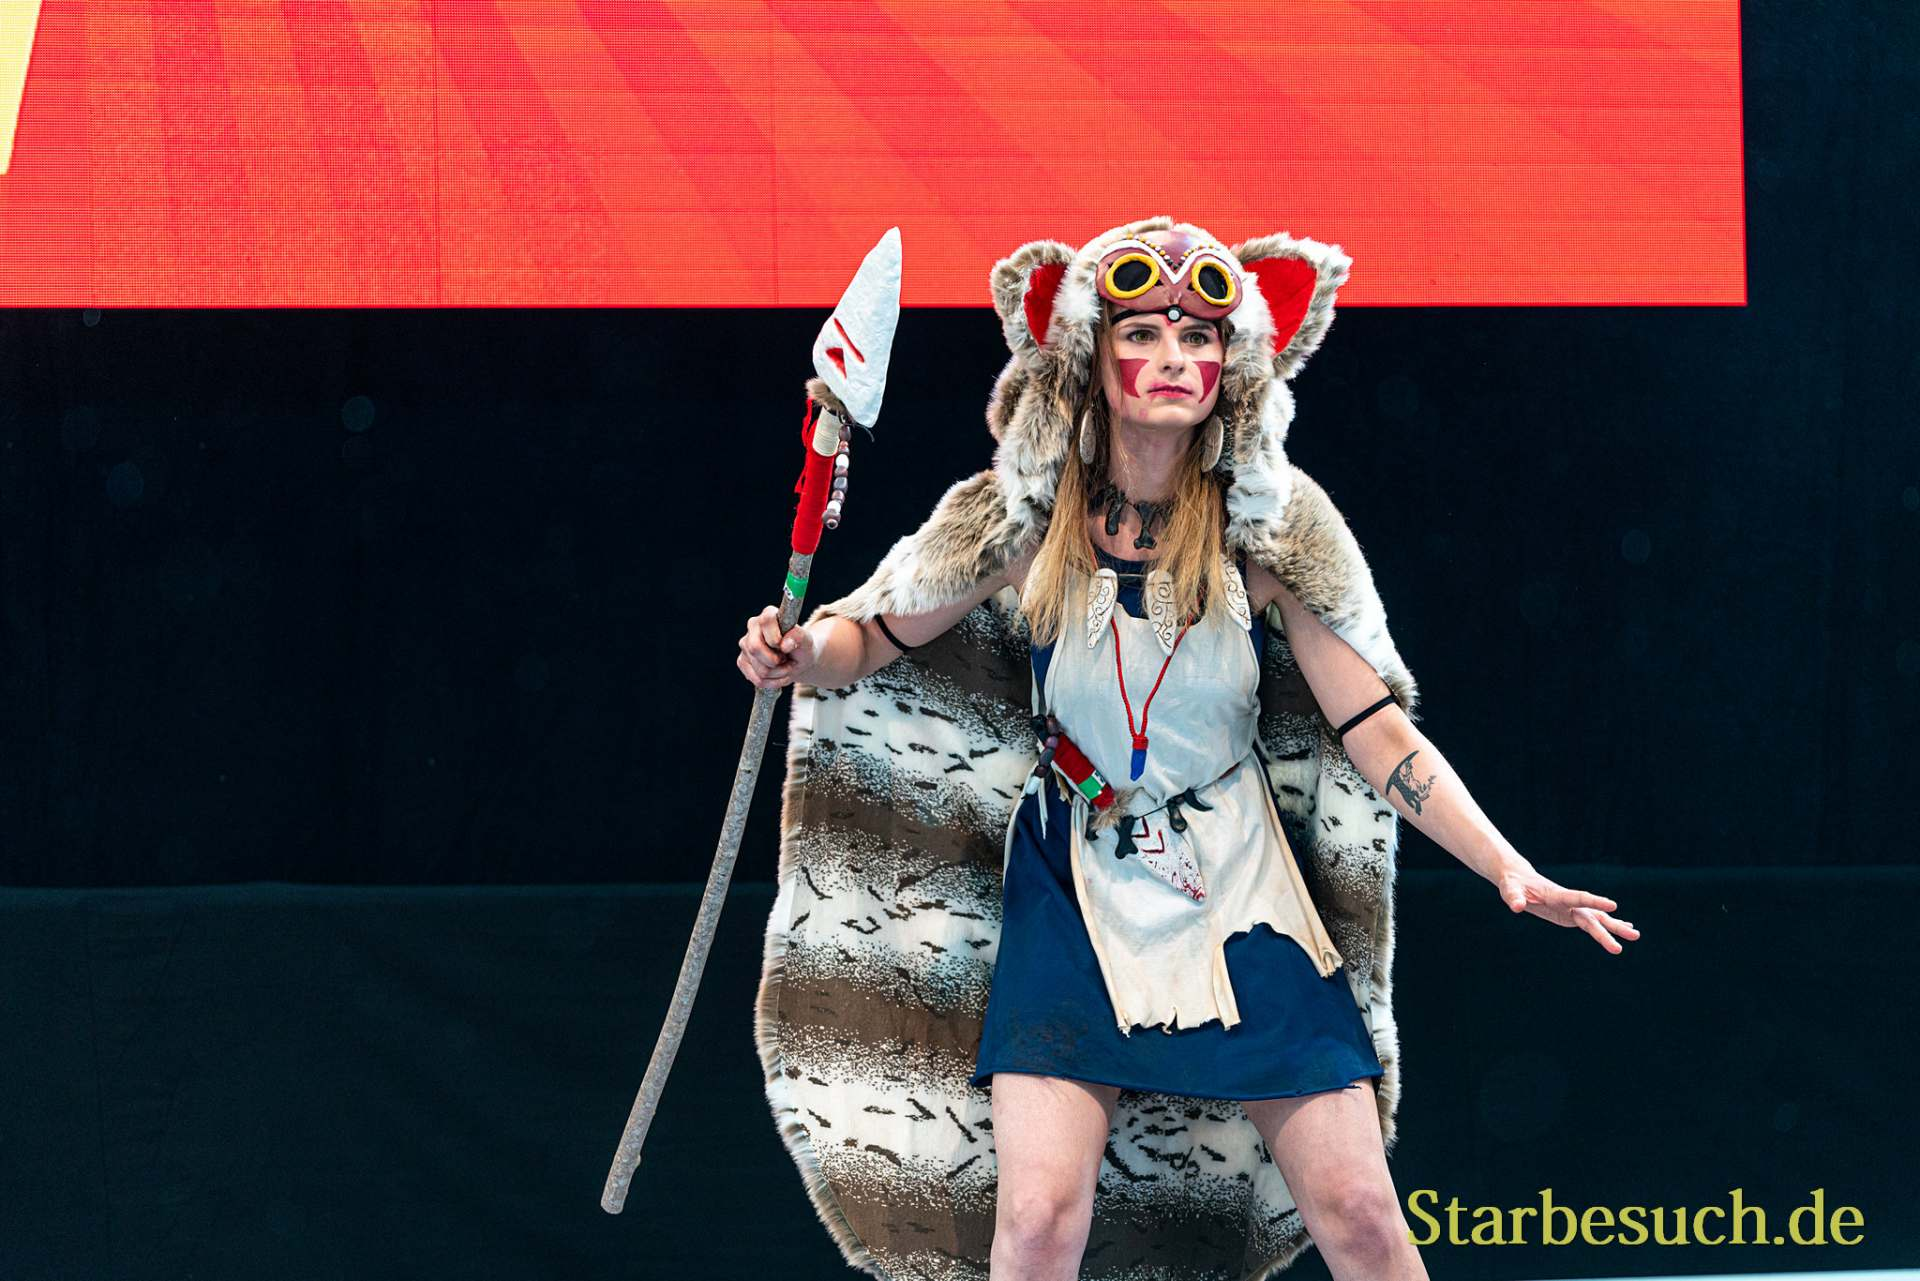 Cosplay Contest #31: Crowdedshadow Cosplay as San from Princess Mononoke